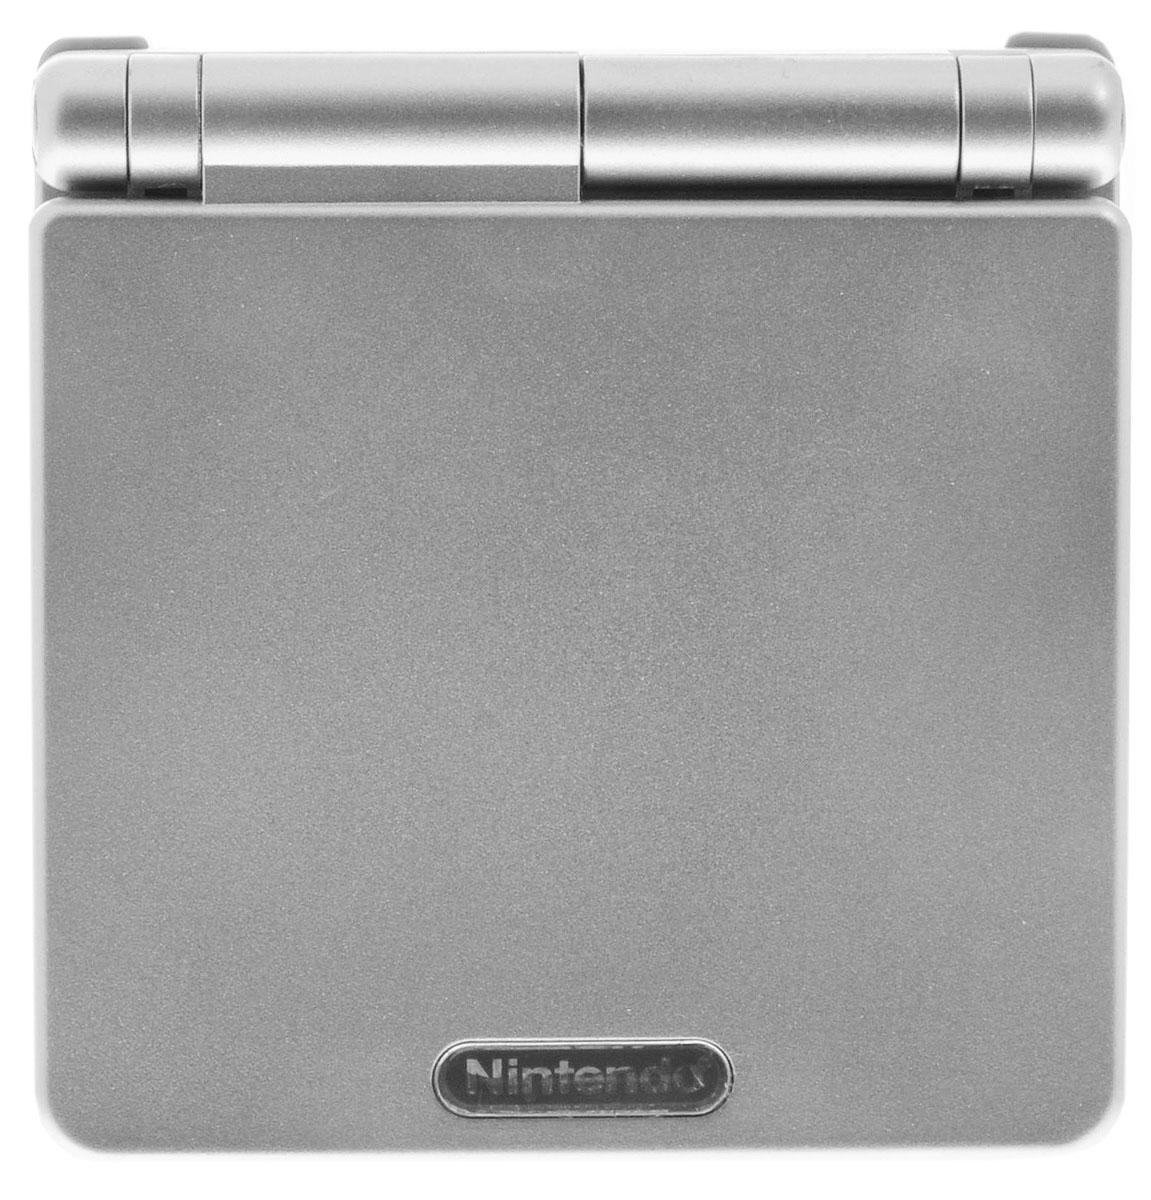 Game Boy Advance SP, Silver игровая приставка (21 игра) ( 45496713850 )